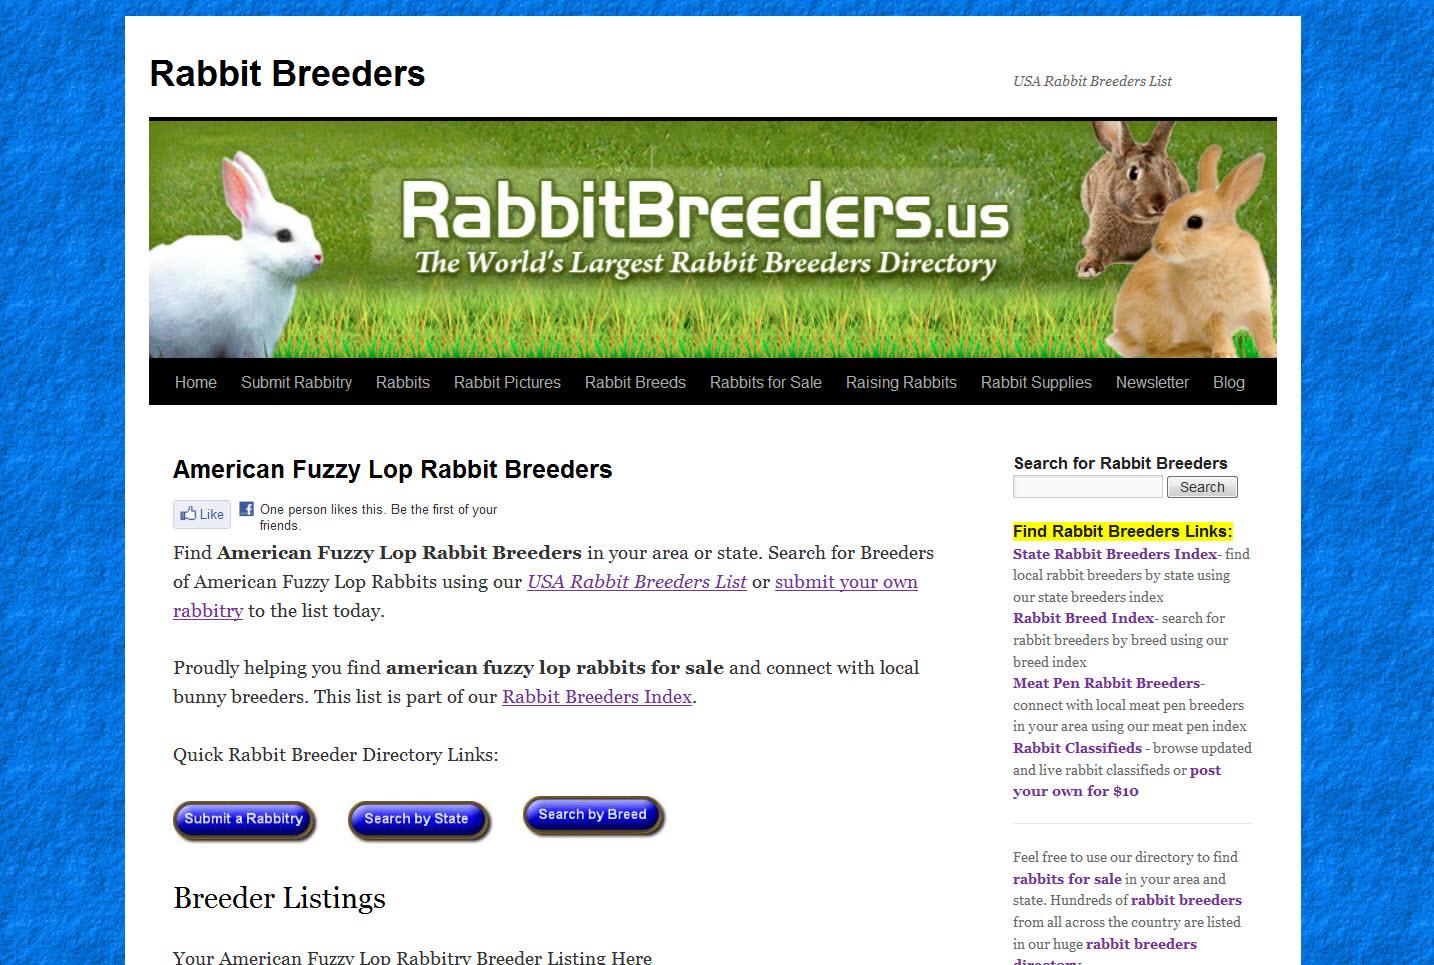 American Fuzzy Lop Rabbit Breeders